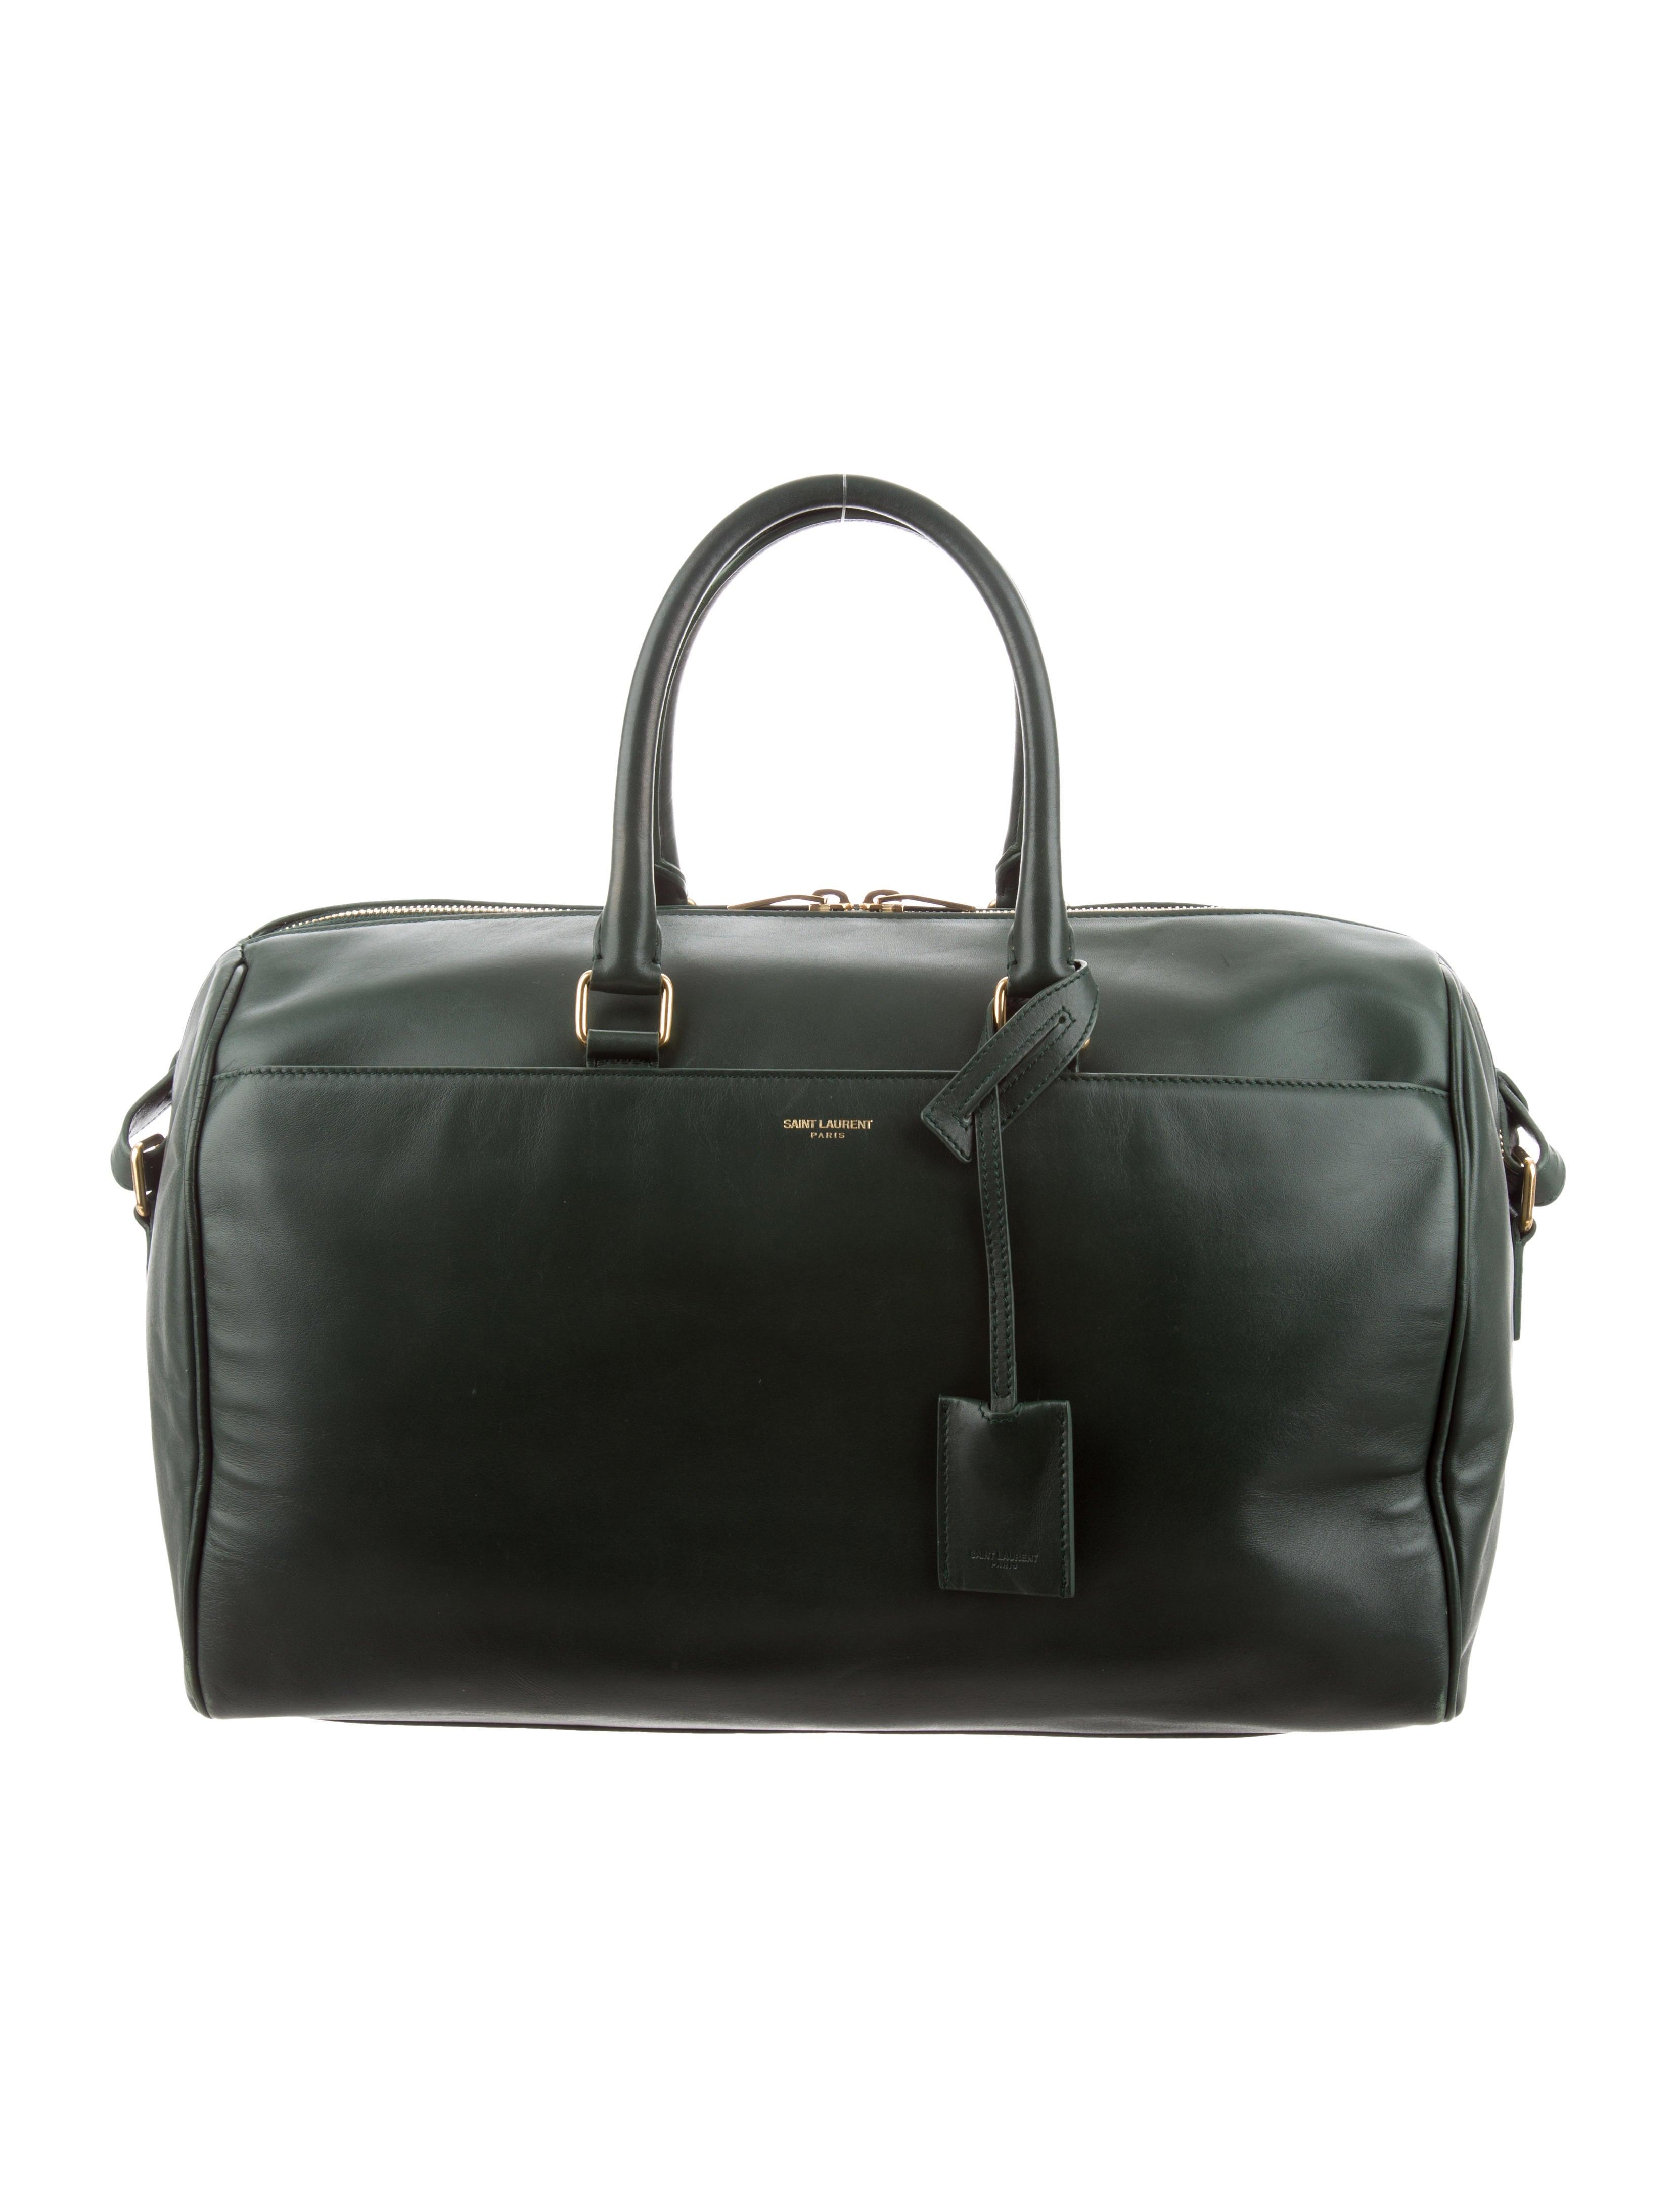 d8f49439576c Saint Laurent Classic Duffle 6 - Handbags - SNT62951